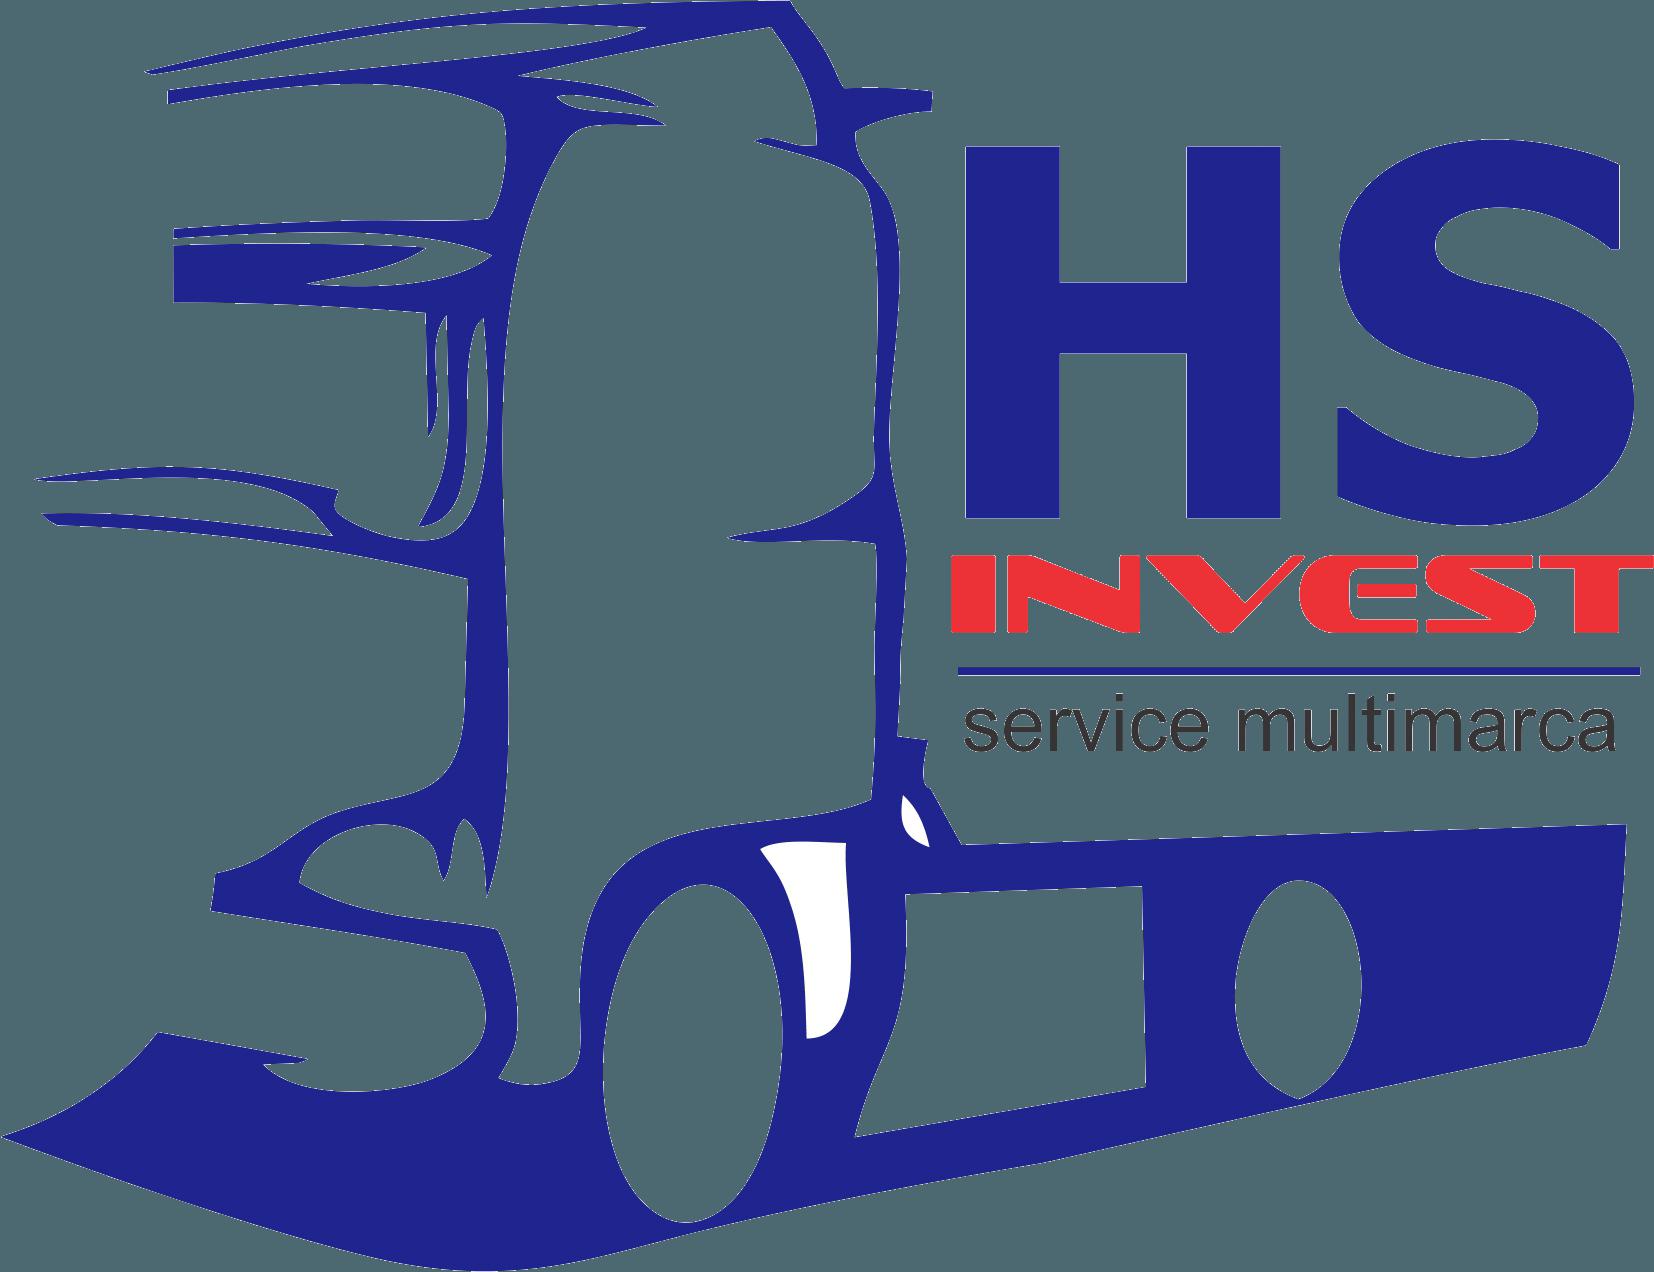 Service auto multimarca Sibiu – HS Invest